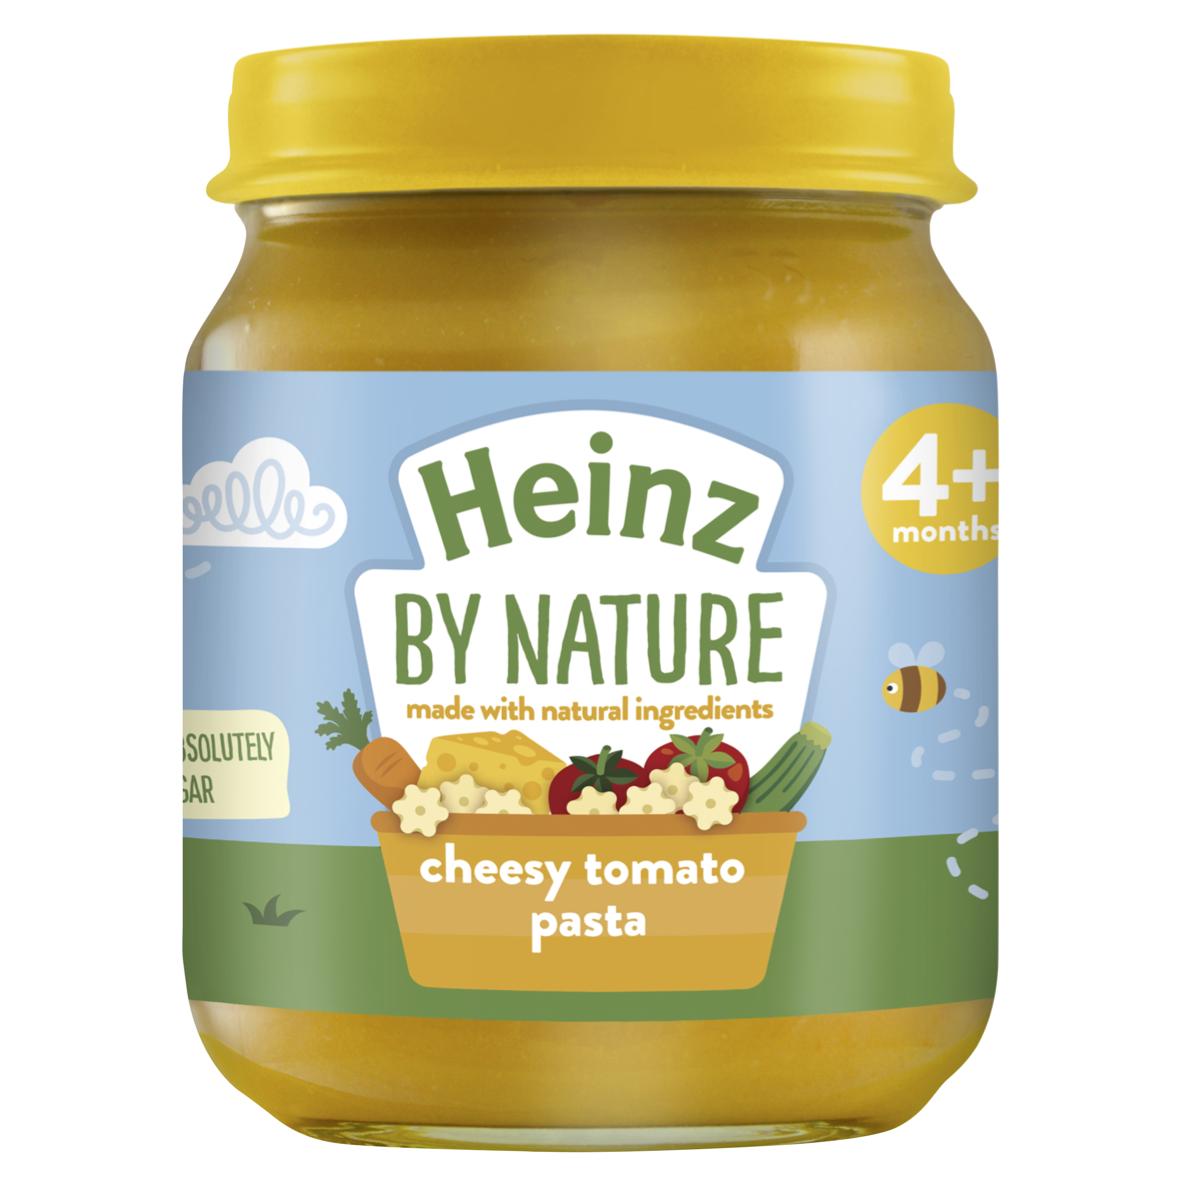 Photograph of 6x Heinz Cheesy Tomato Pasta 120g product